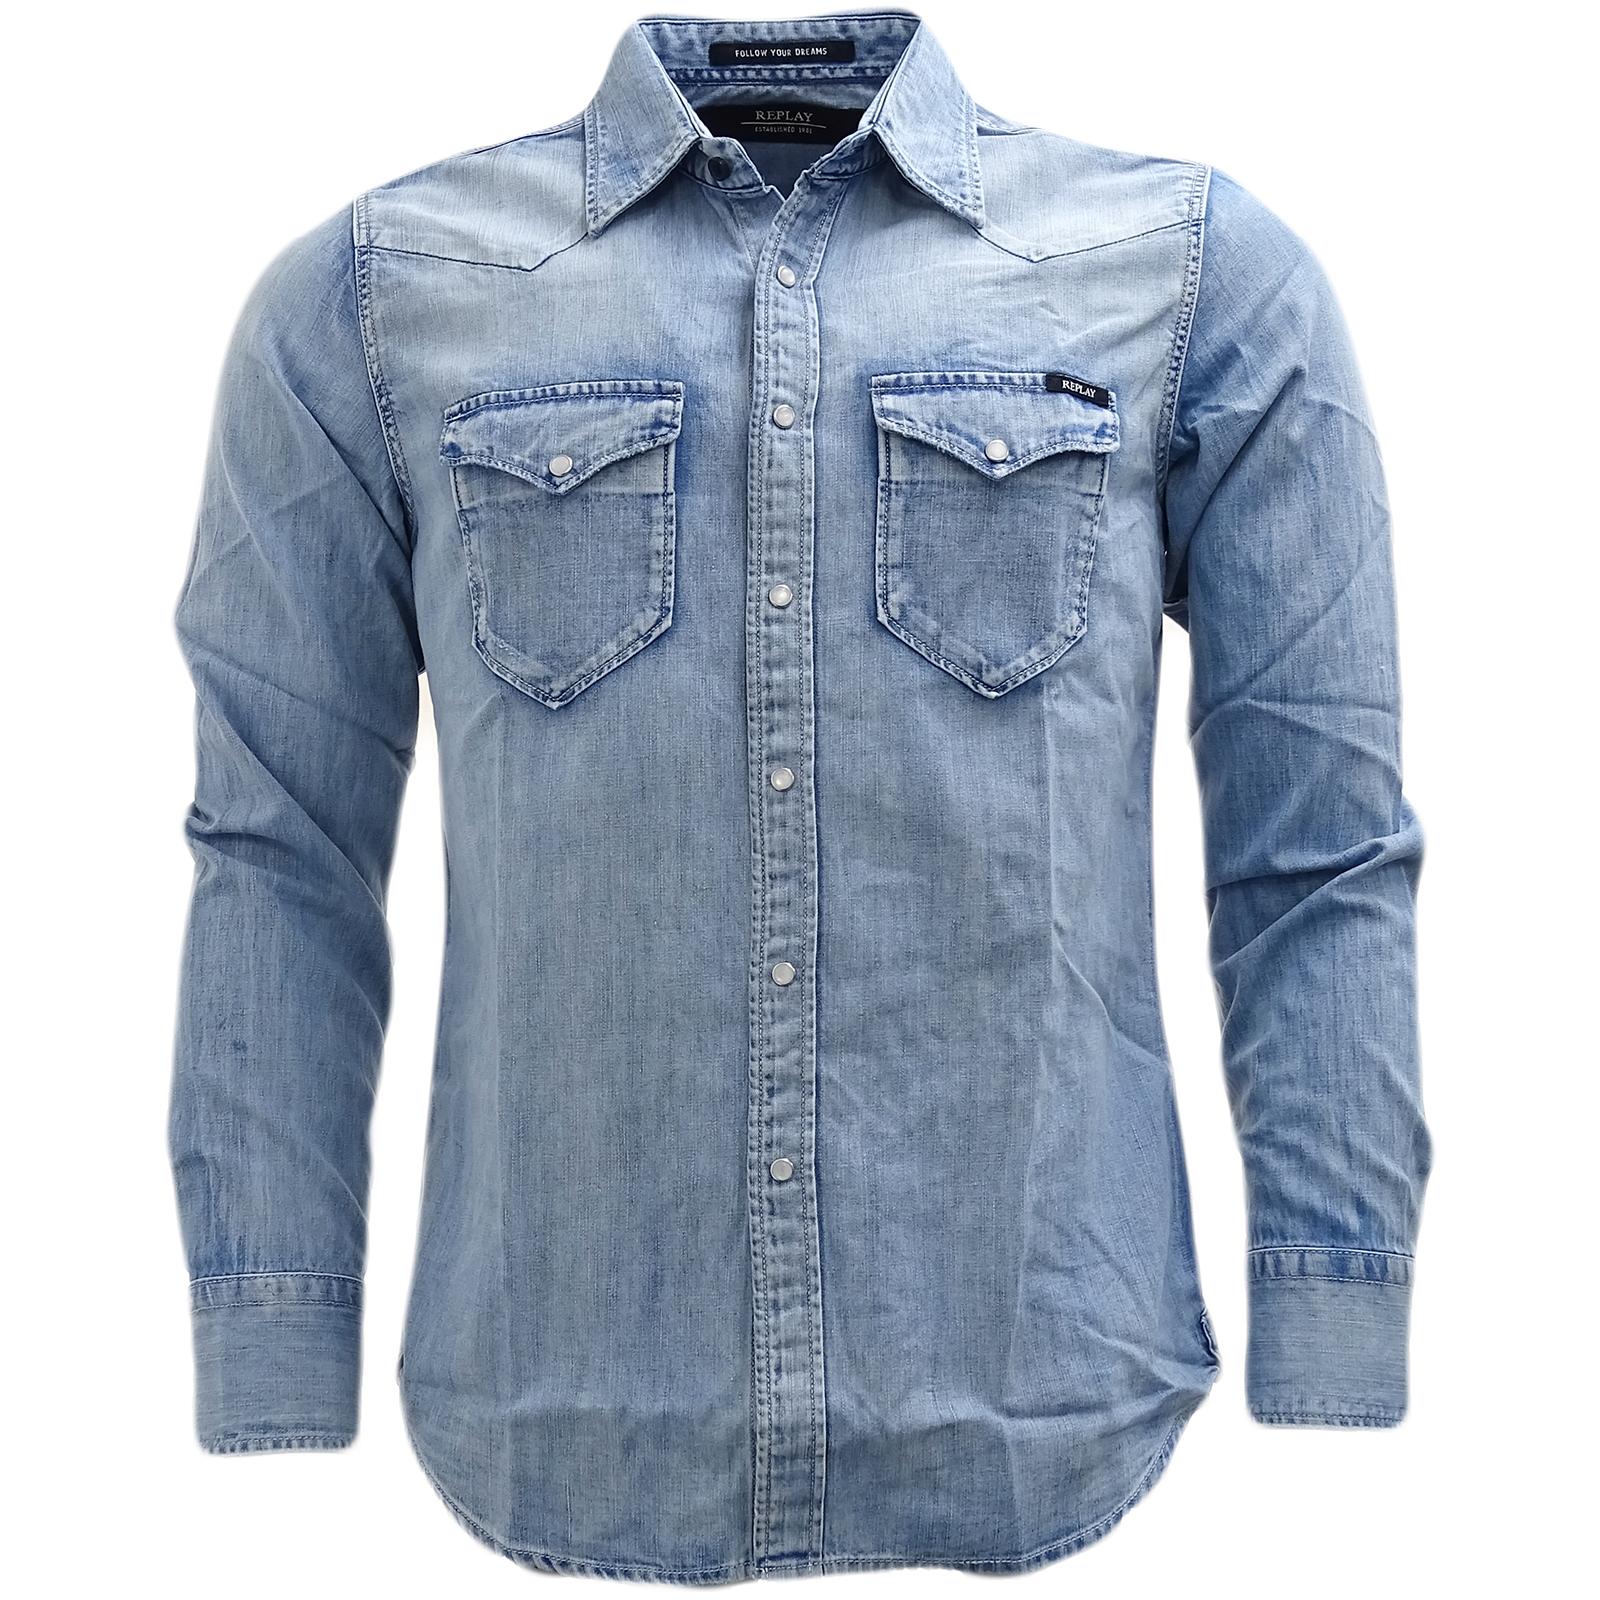 3afdf2c11e8 Sentinel Replay Blue Lightweight Popper Front Western Denim Shirt Shirt -  M4981.26C.295.0